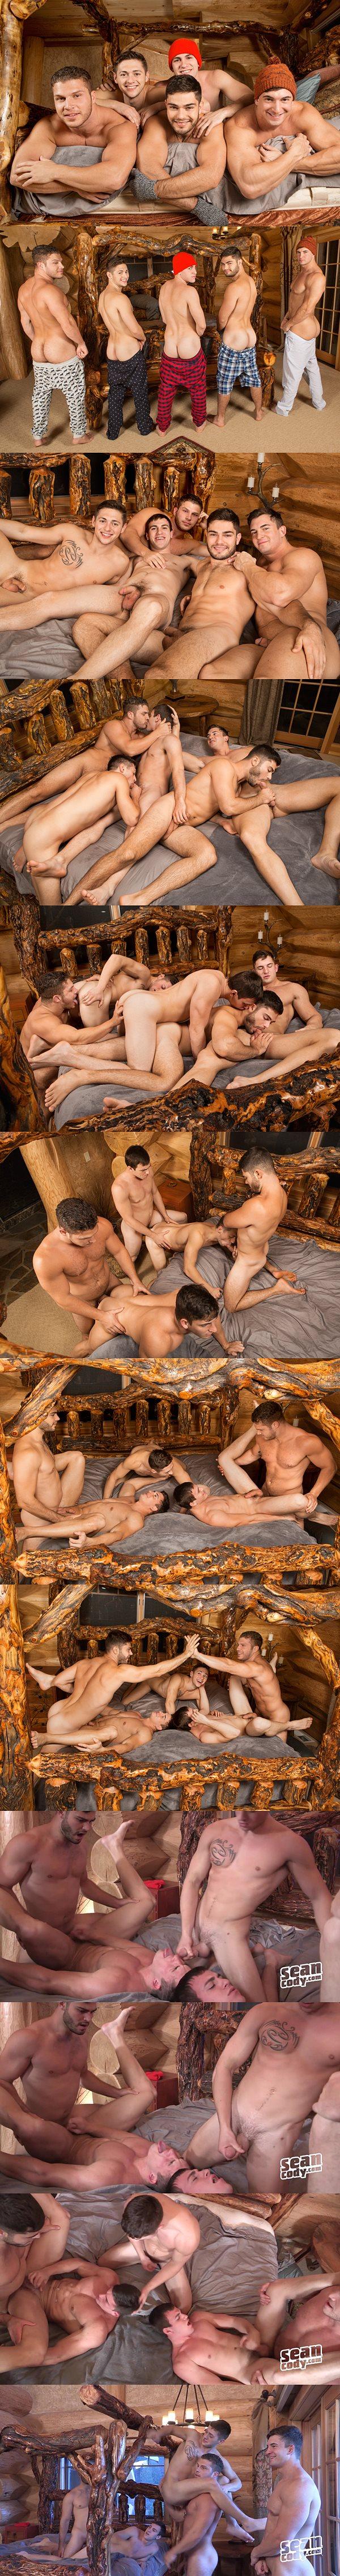 Muscle jocks Lane, Brodie, Joey, Tanner and Rowan have hot bareback orgy in Winter Getaway Day 1 at Seancody 02